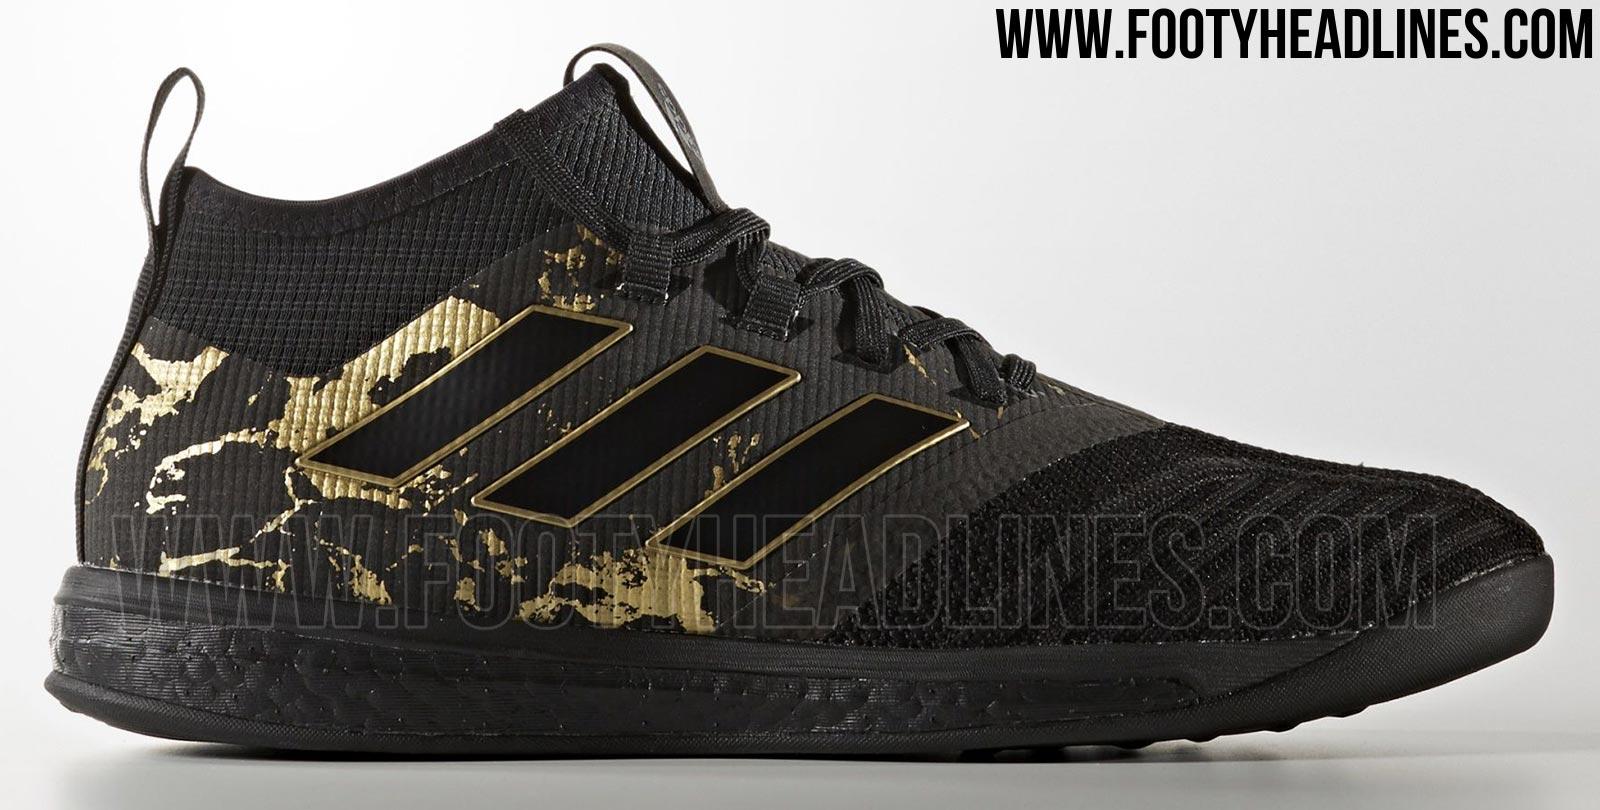 pretty nice 180f7 23868 Adidas Ace Tango 17.1 Trainer Paul Pogba - Black  Gold Metallic